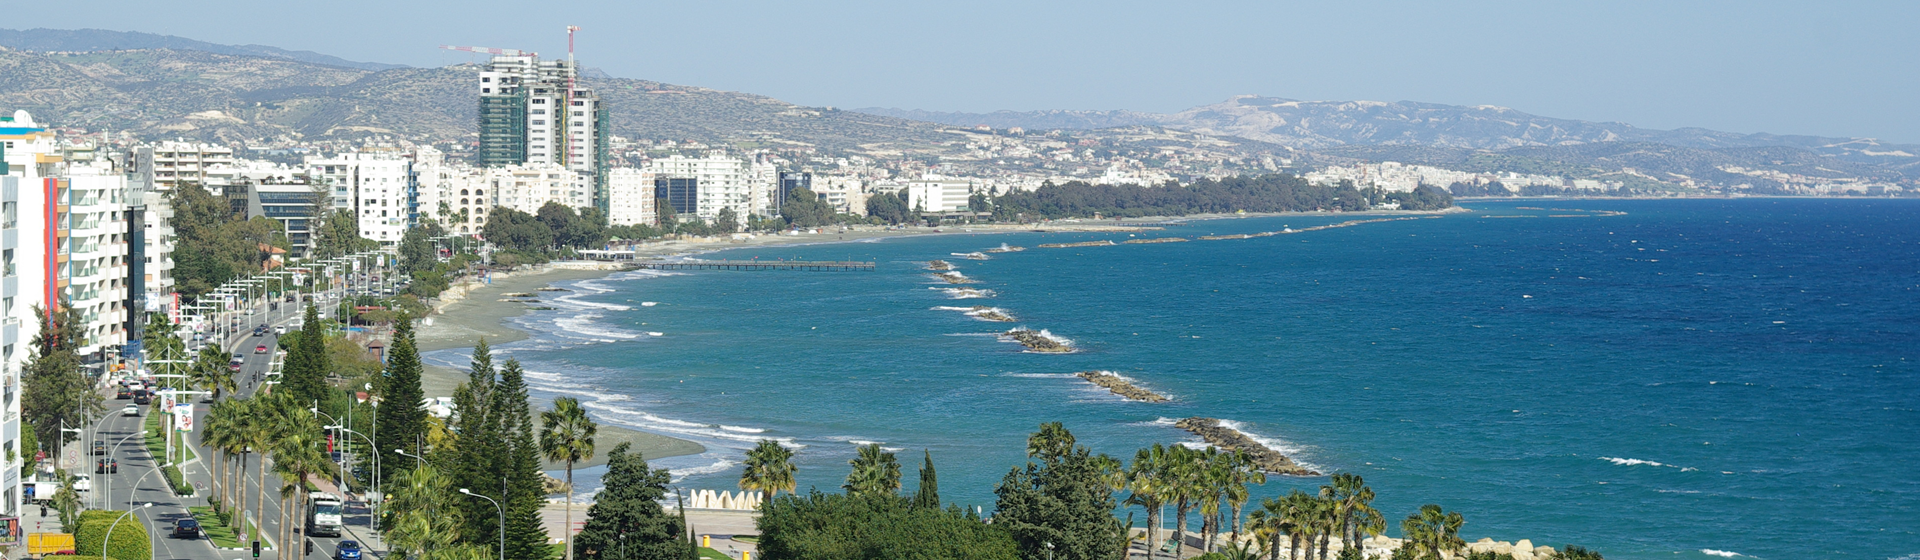 Limassol2